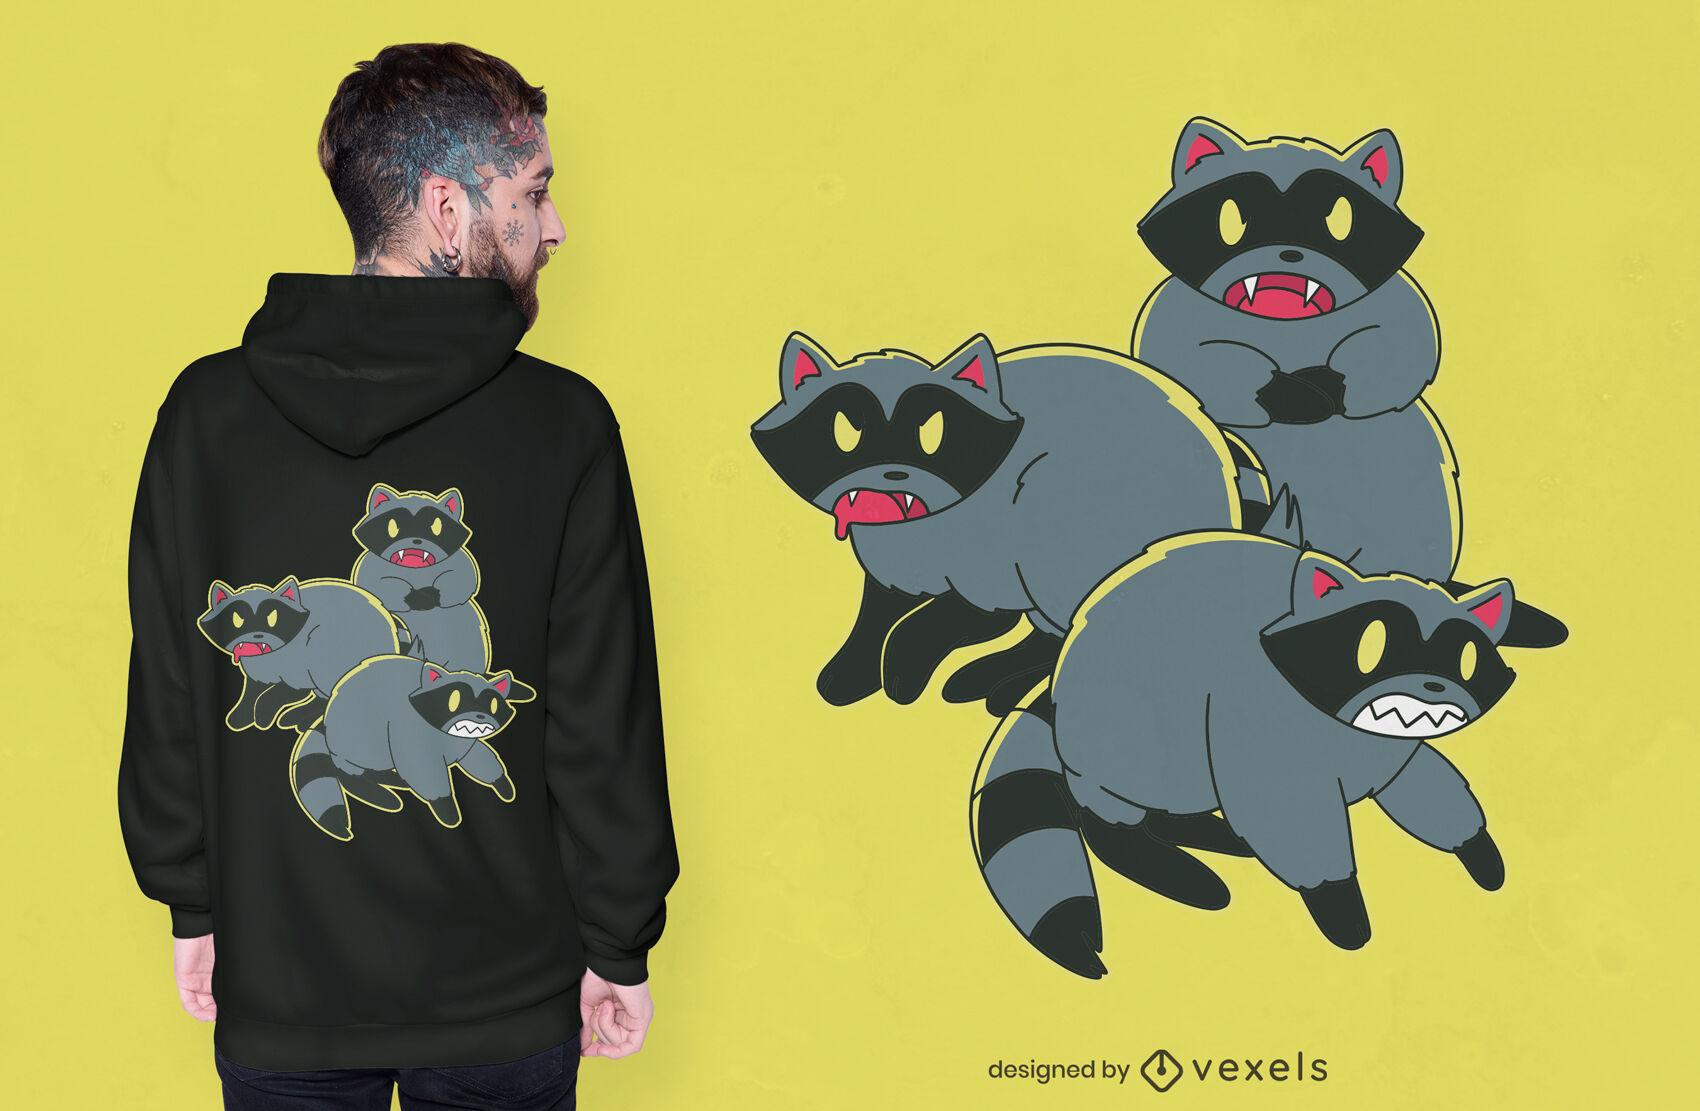 Desenho de t-shirt de guaxinins raivosos